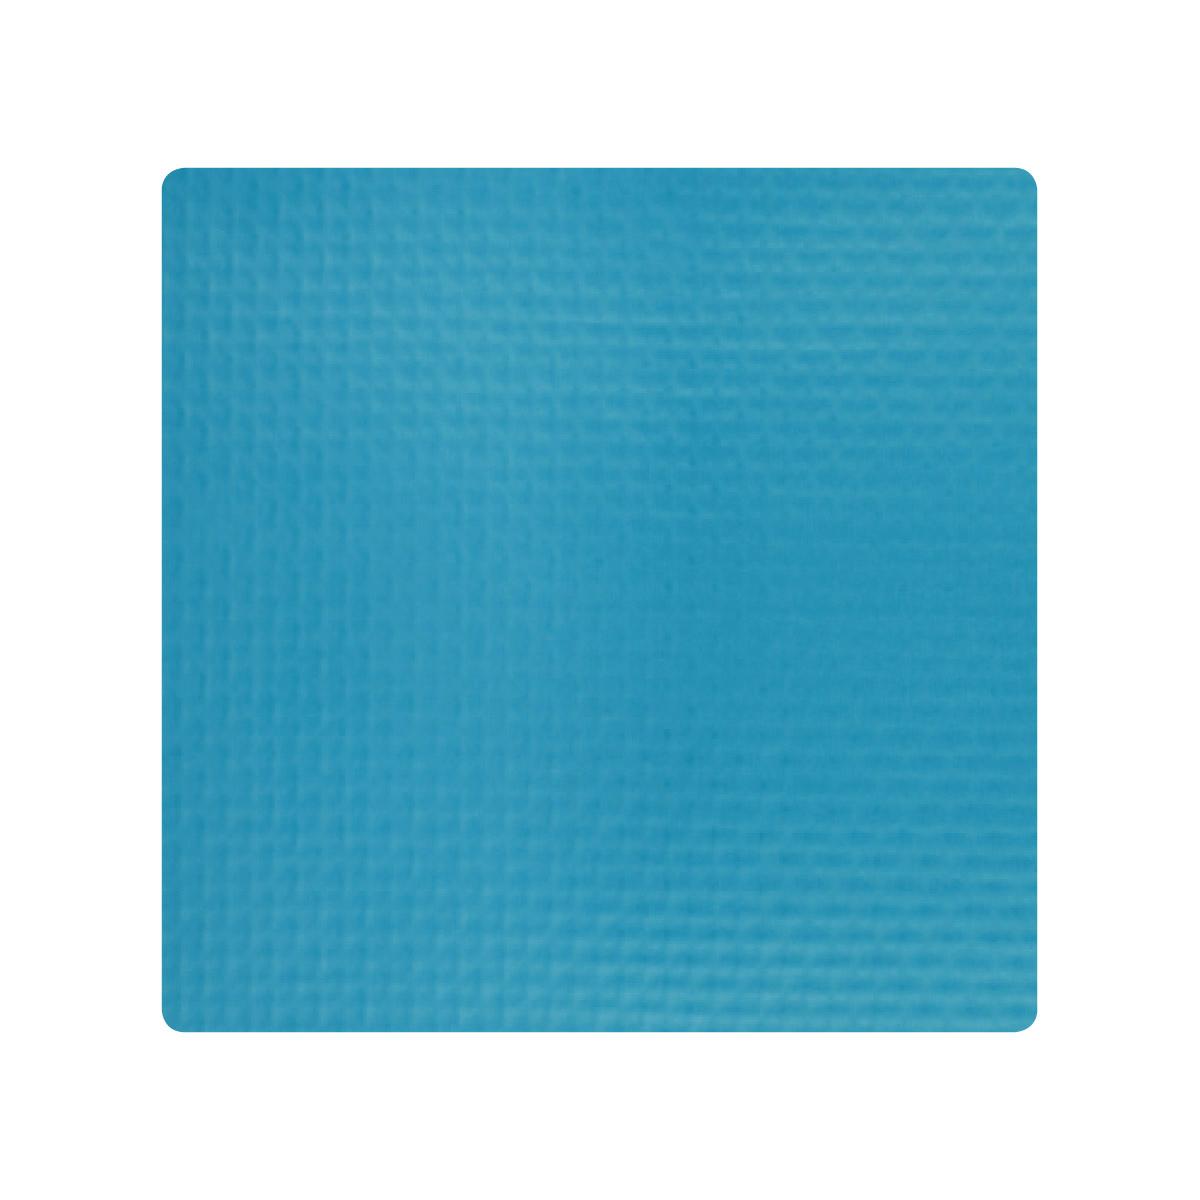 Swimming pool liner deluxe dark blue, 165 cm Swimming pool liner deluxe dark blue, 165 cm